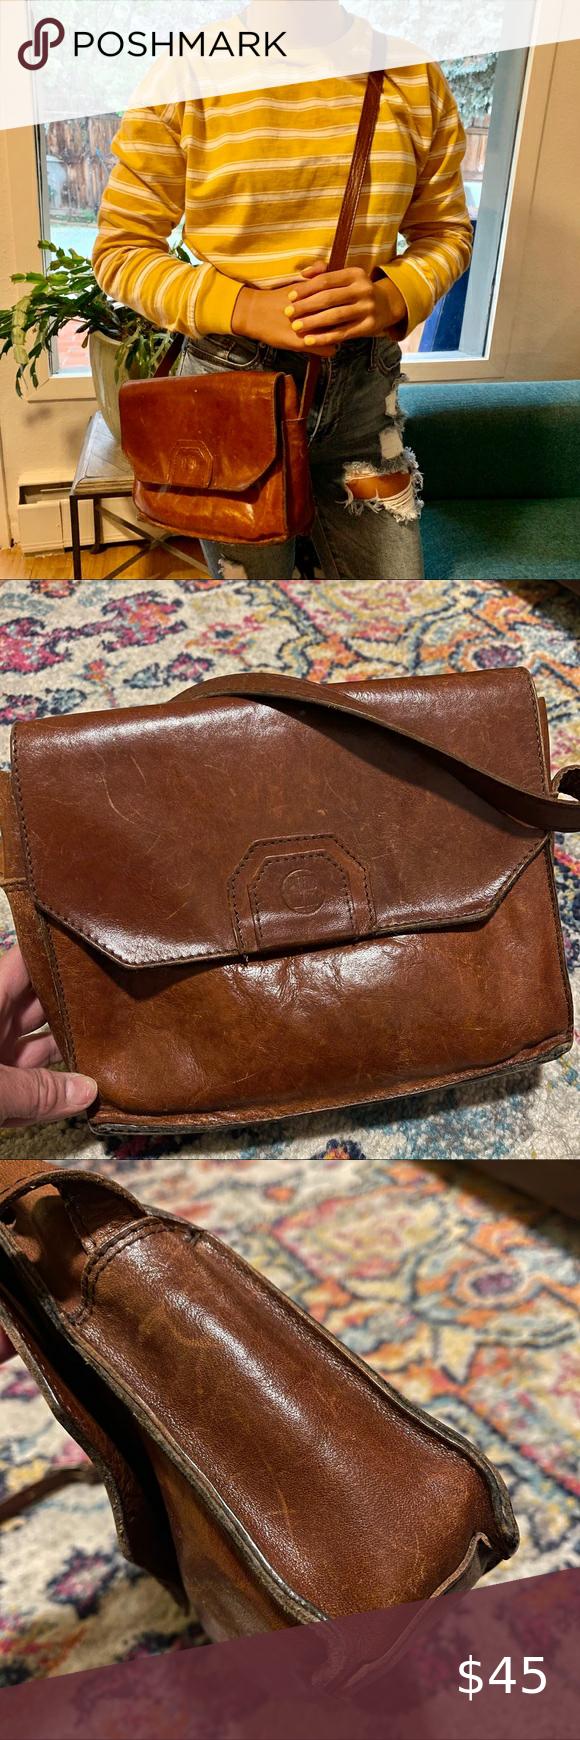 Vintage Boxca Mid Century Denmark Made Bag Western Style Purse Purple Handbags Tapestry Bag